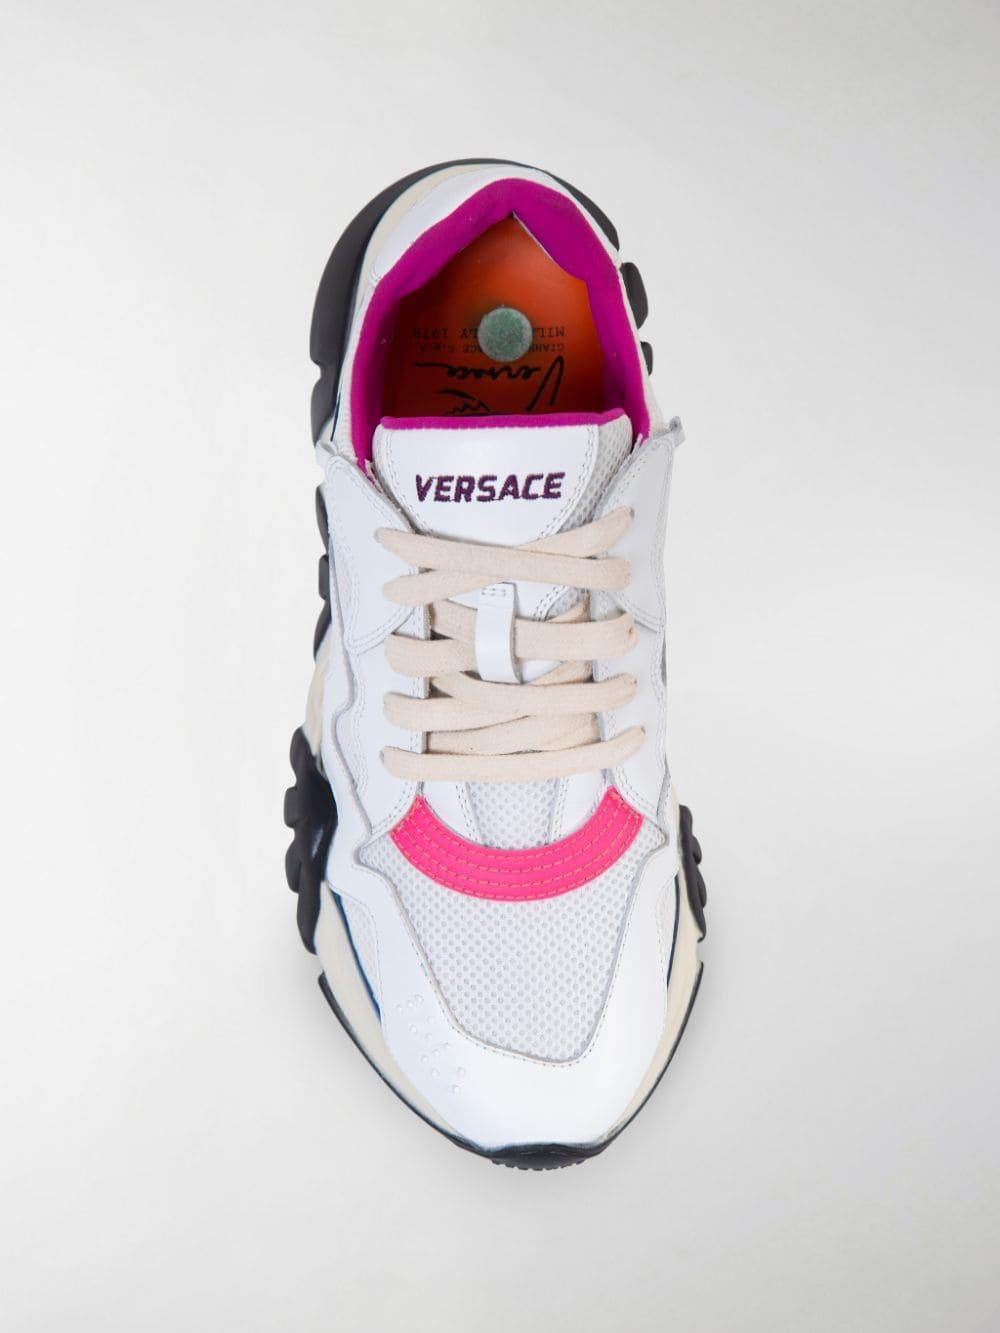 Versace Squalo Sneakers Lyst